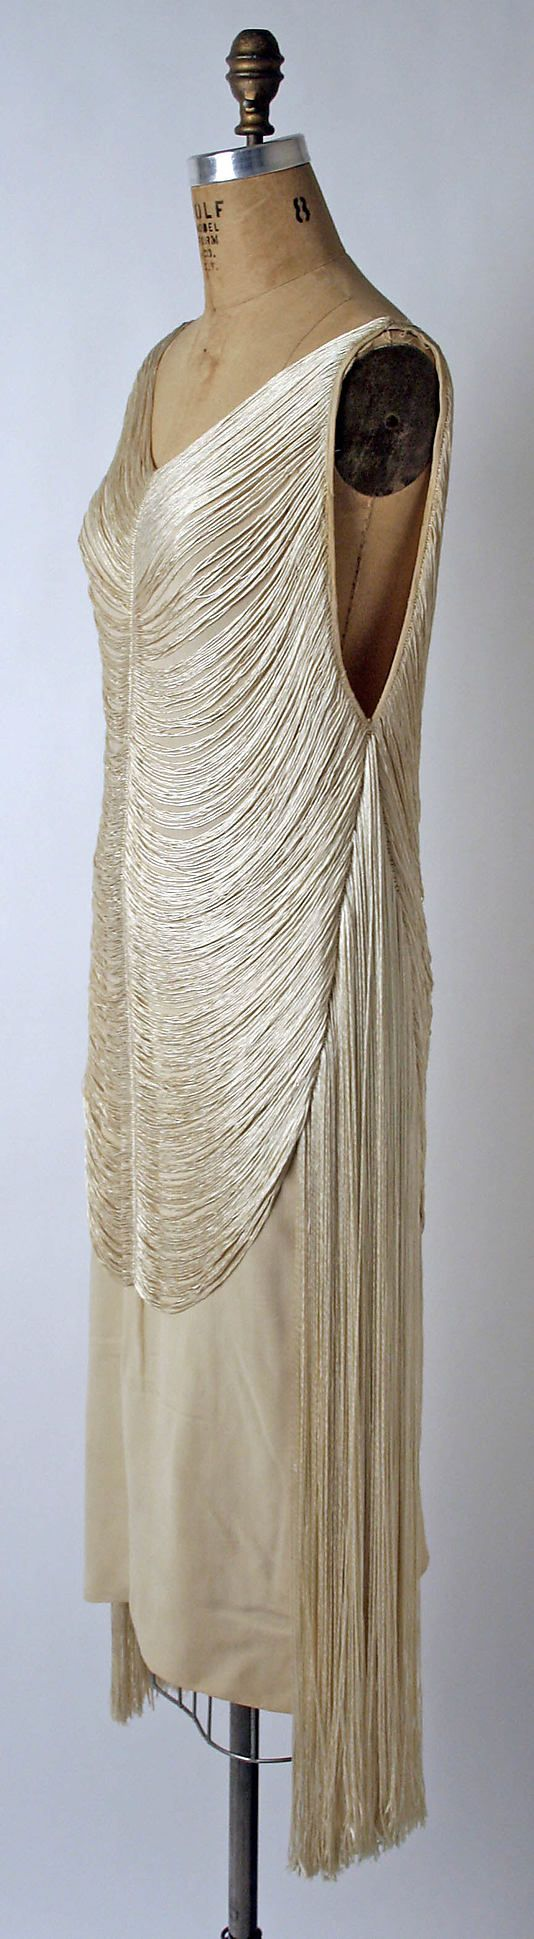 Evening dress Madeleine Vionnet  (French, Chilleurs-aux-Bois 1876–1975 Paris)   Maker: Sophie Gimbel (American) Date: 1925 Culture: American or European Medium: silk. Sideways